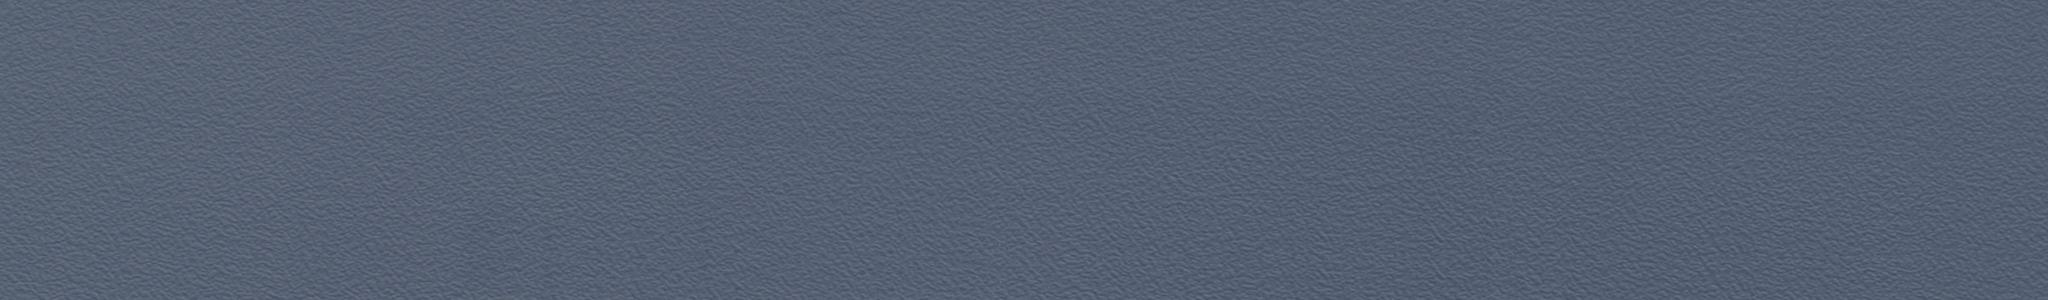 HU 158004 ABS hrana modrá tmavá perla XG